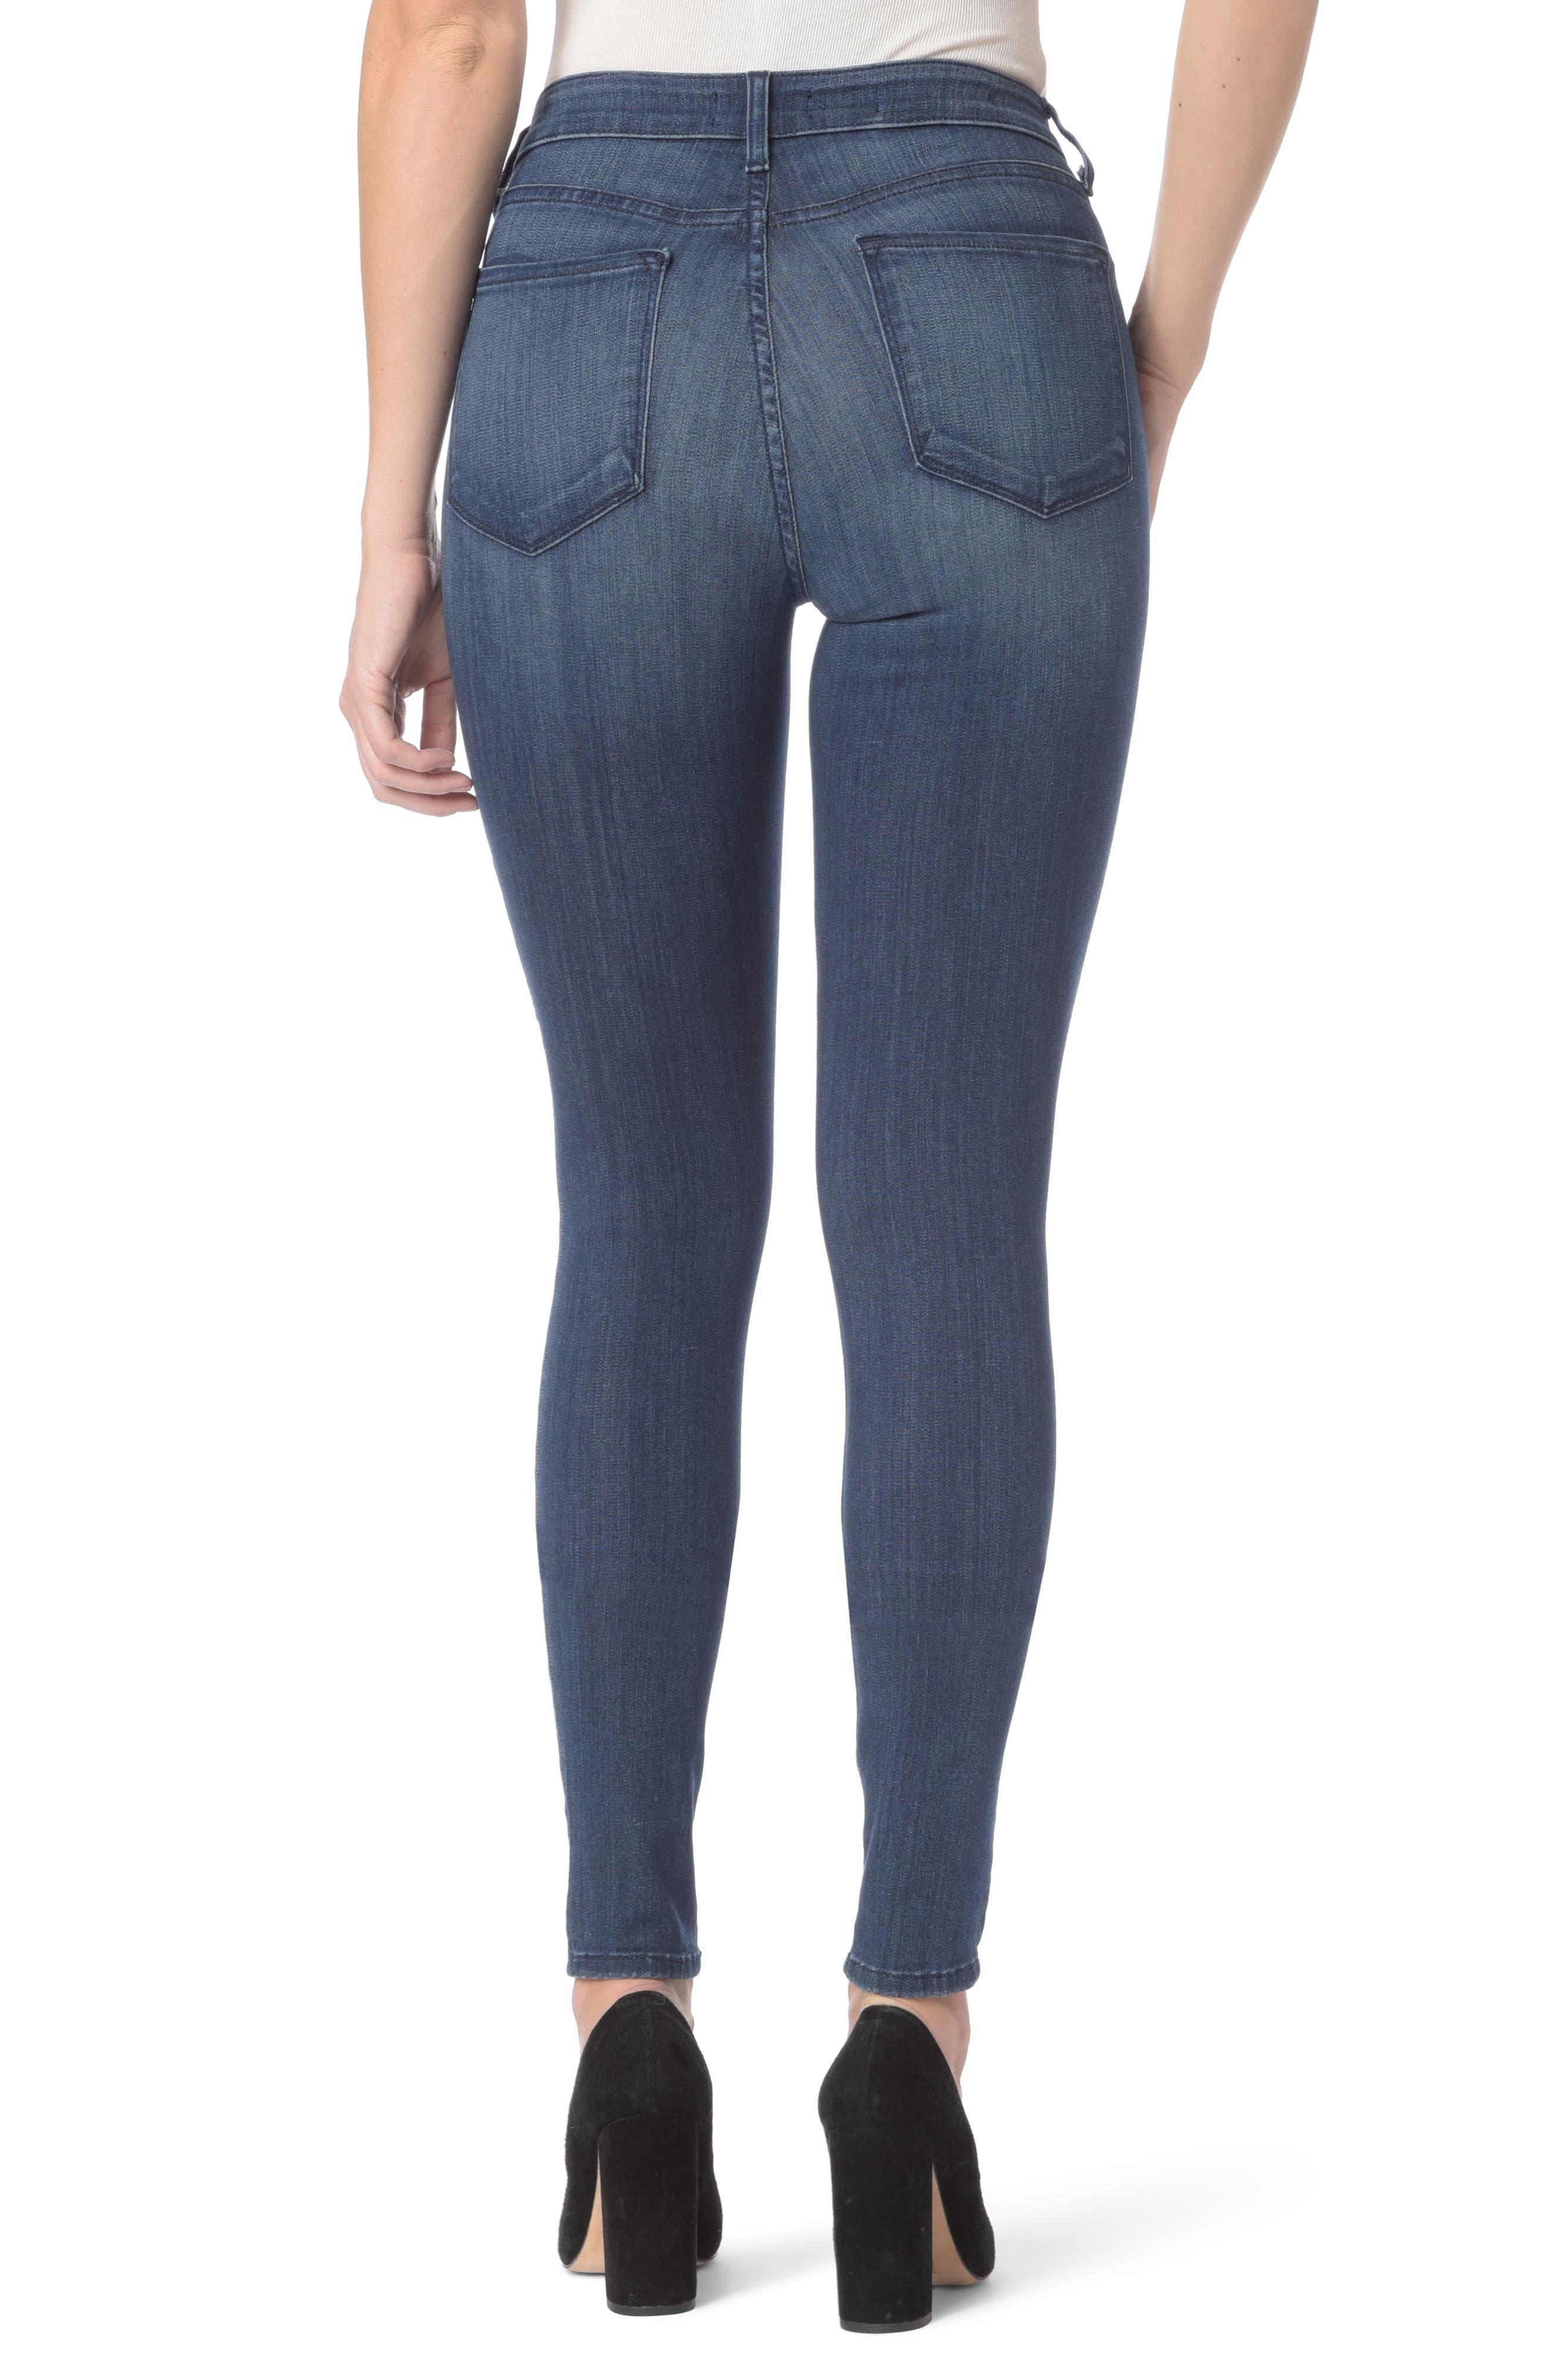 Ami Stretch Super Skinny Jeans,                             Alternate thumbnail 2, color,                             Lark